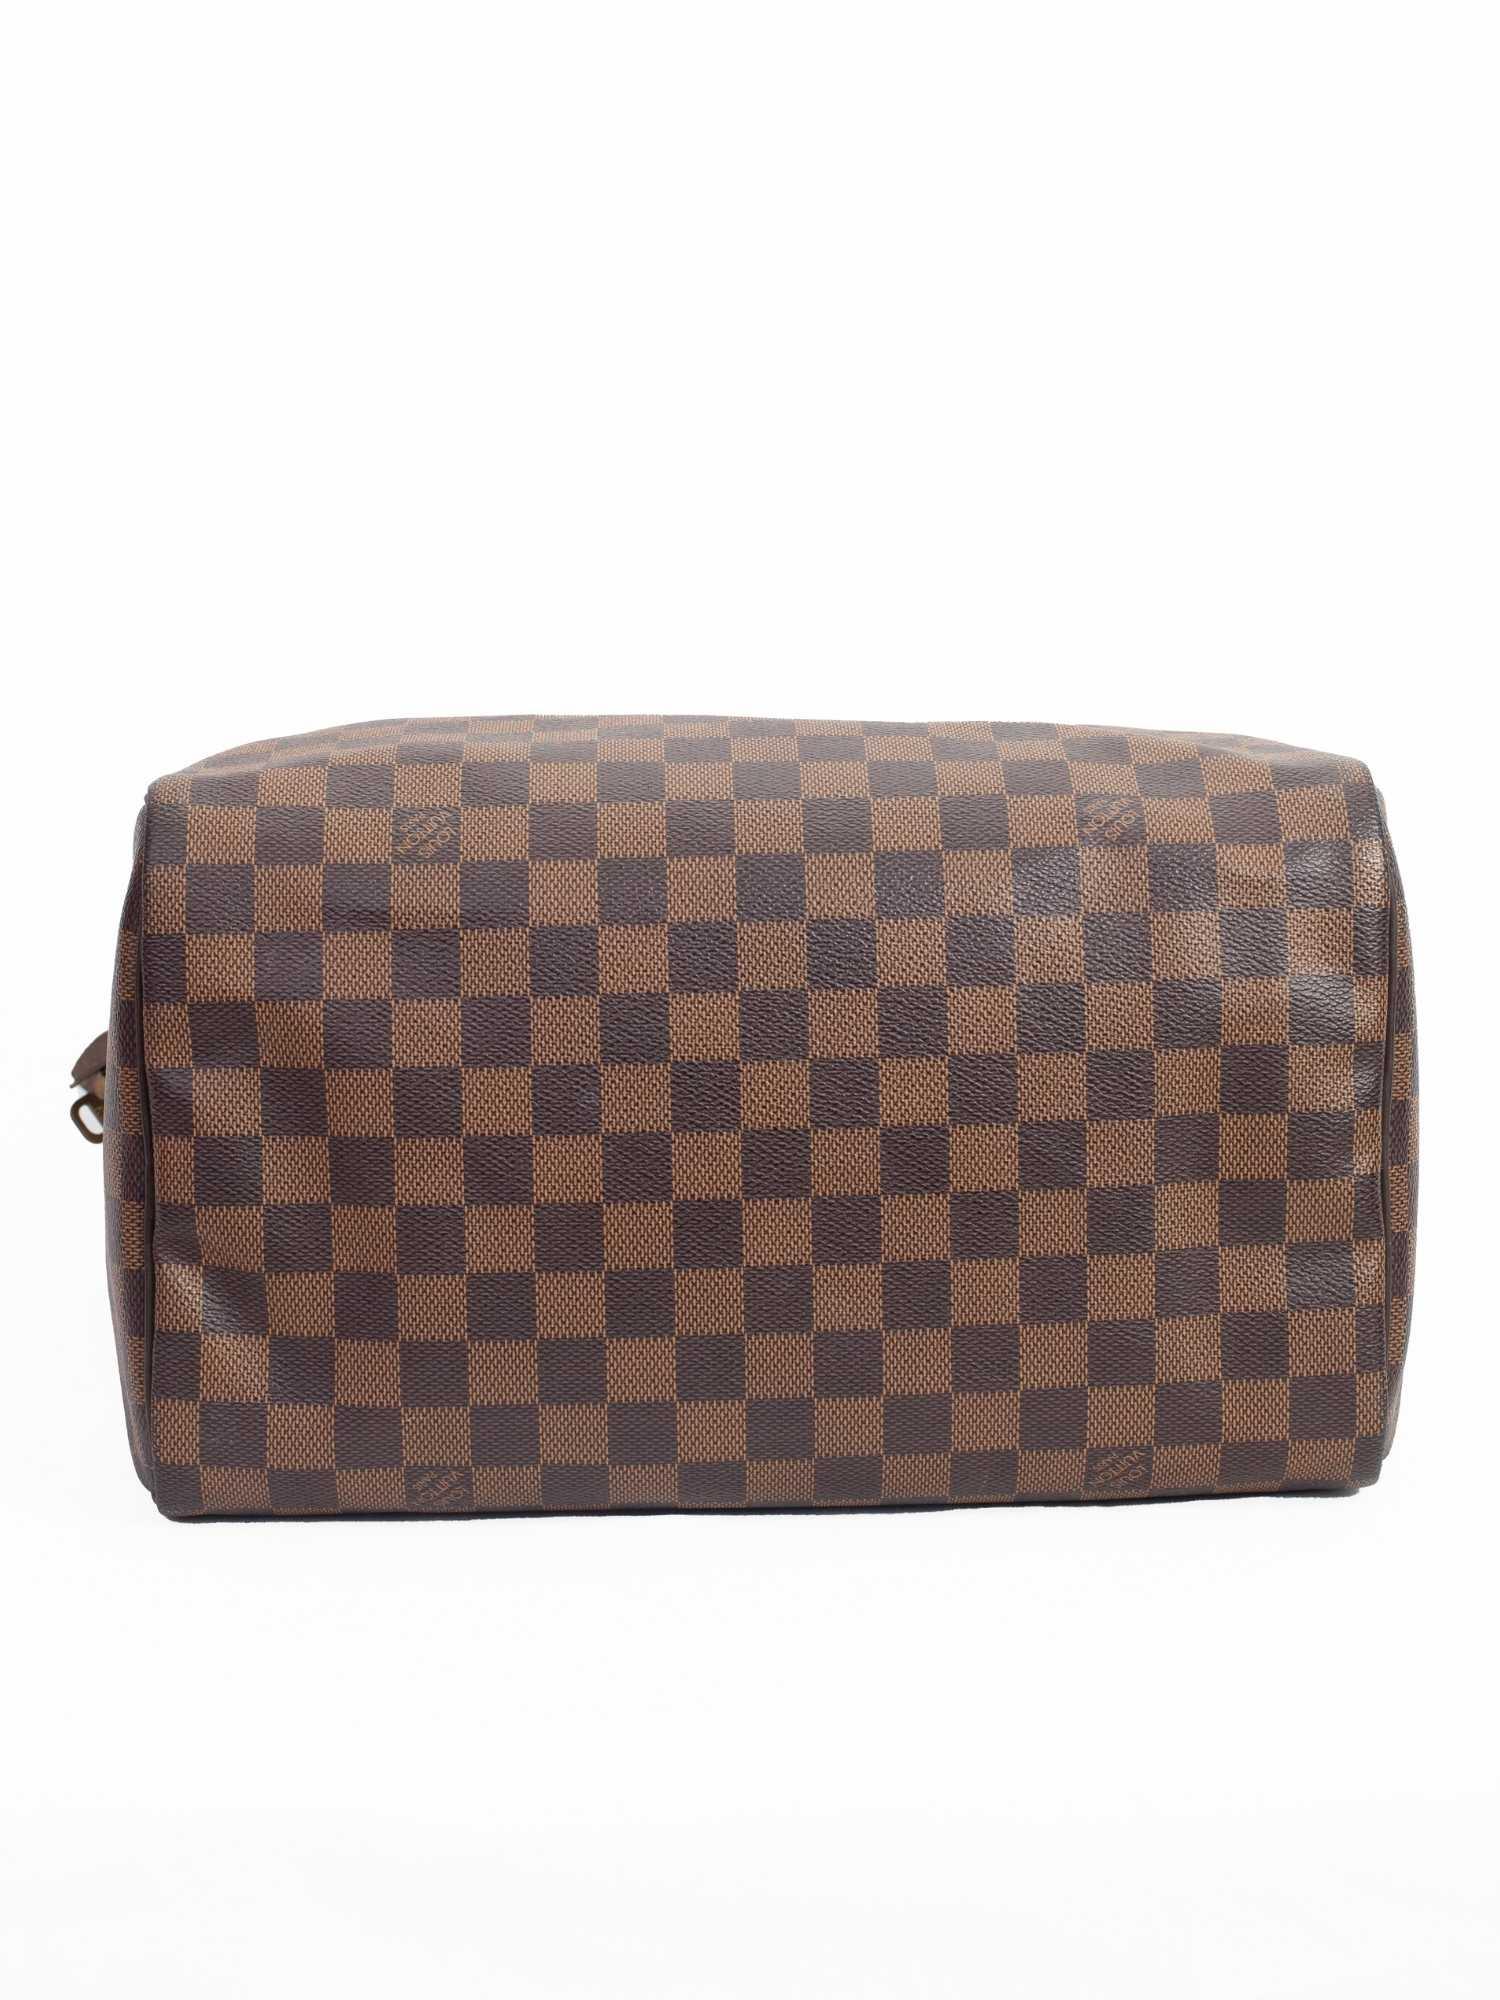 Bolsa Louis Vuitton Speedy 30 Damier Ebene